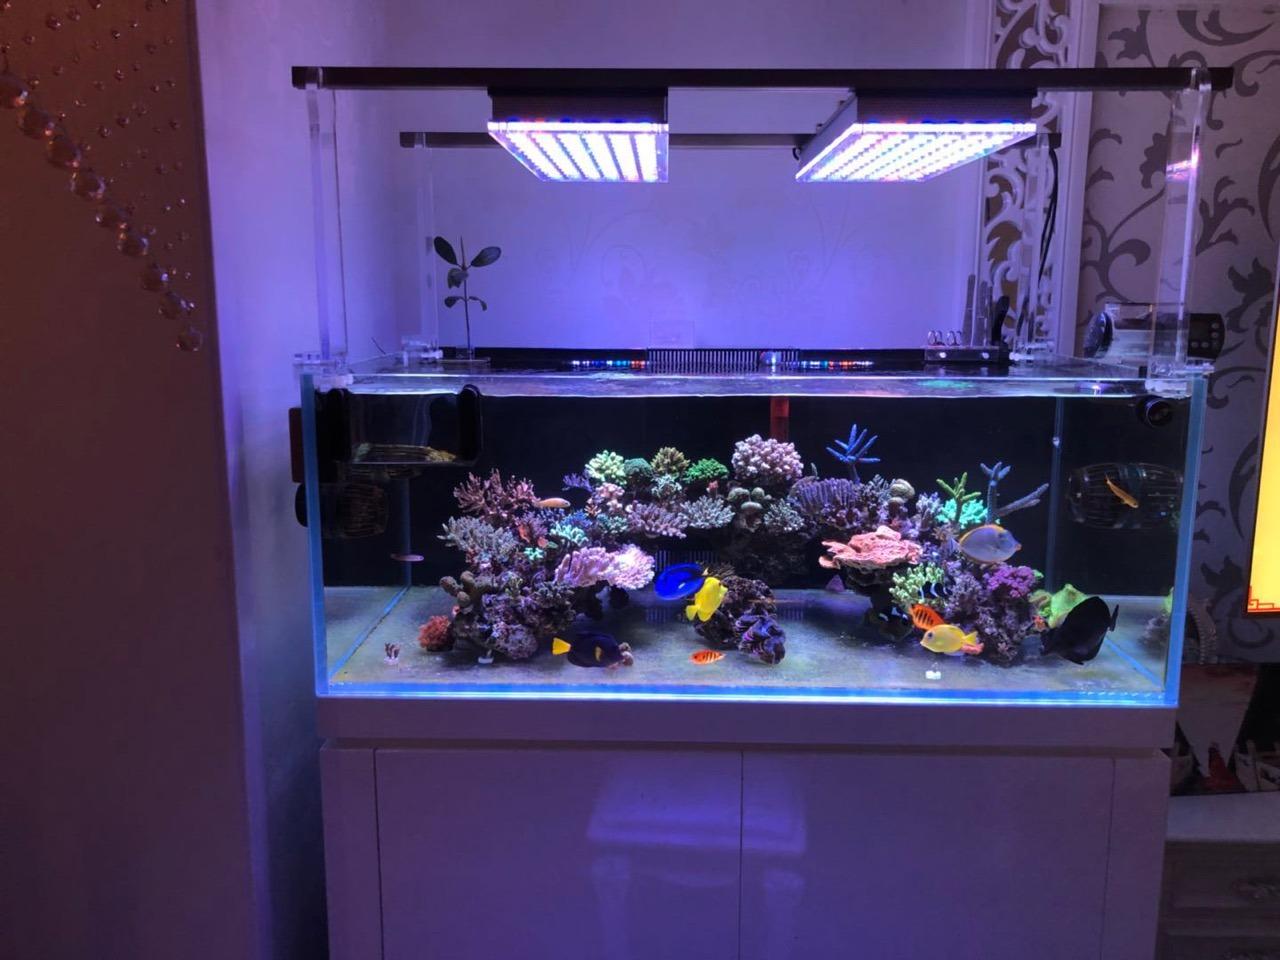 बढ़ते मछलीघर एलईडी प्रकाश व्यवस्था